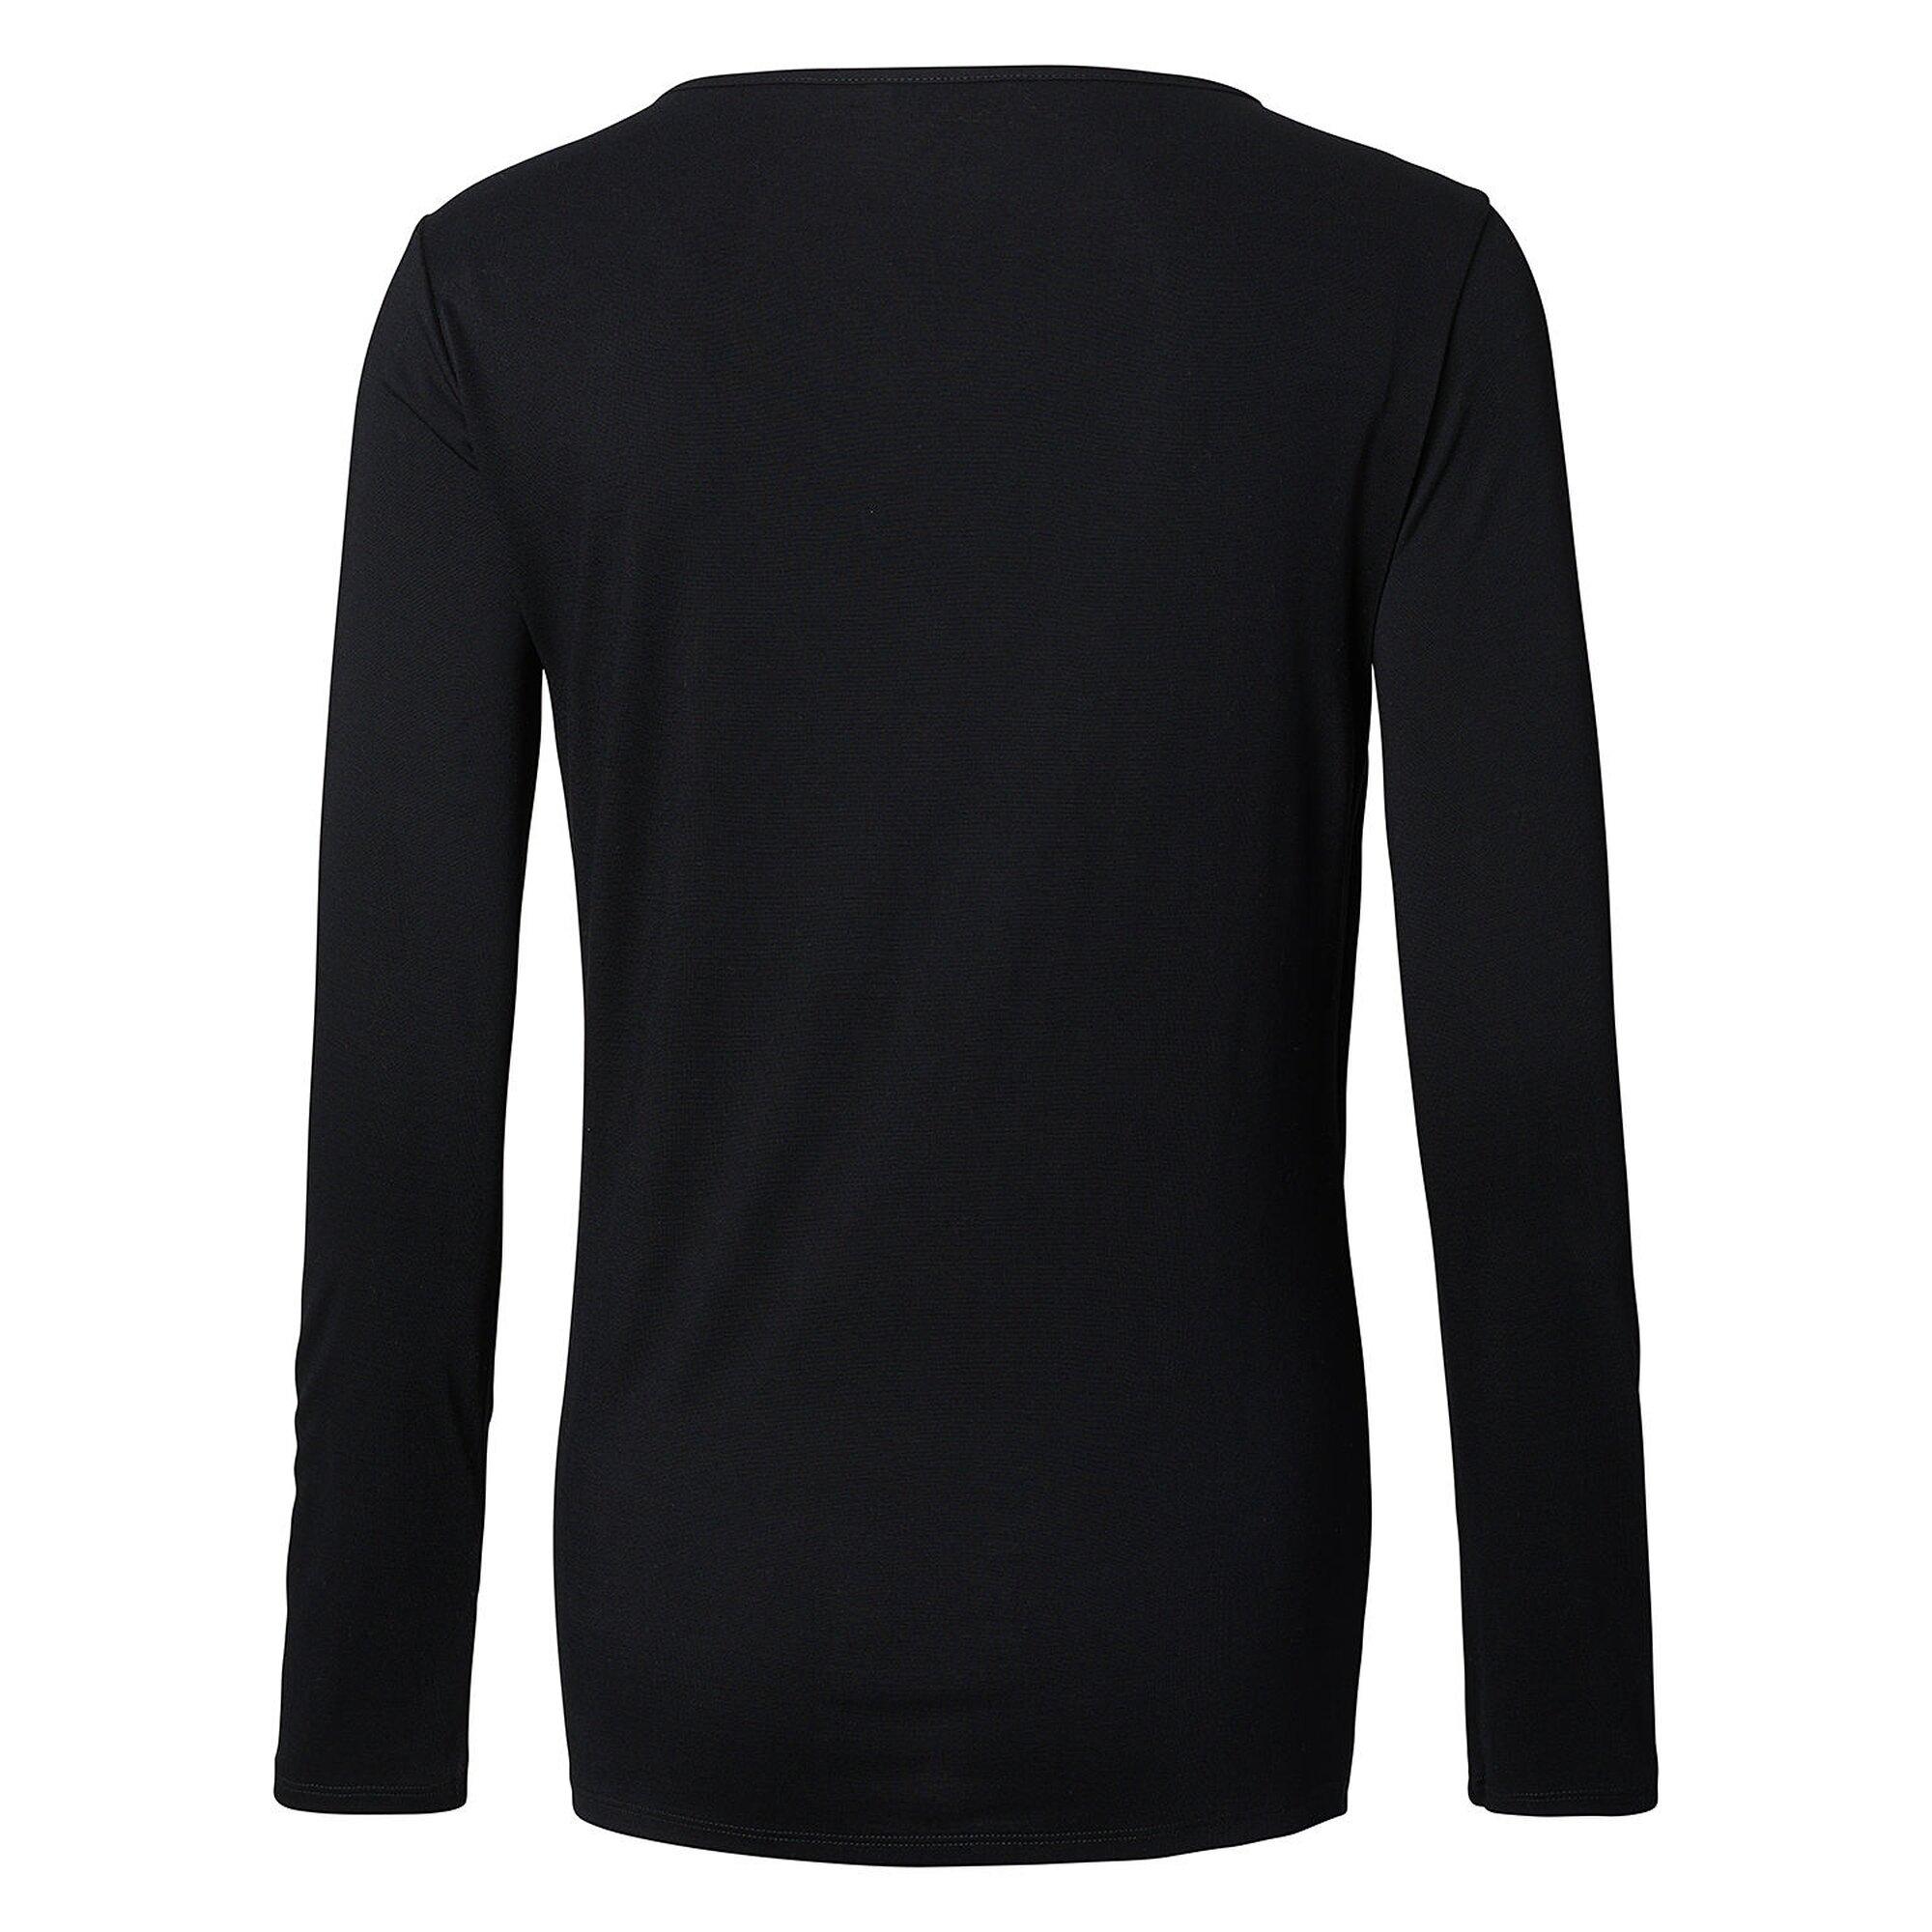 noppies-still-shirt-gemma